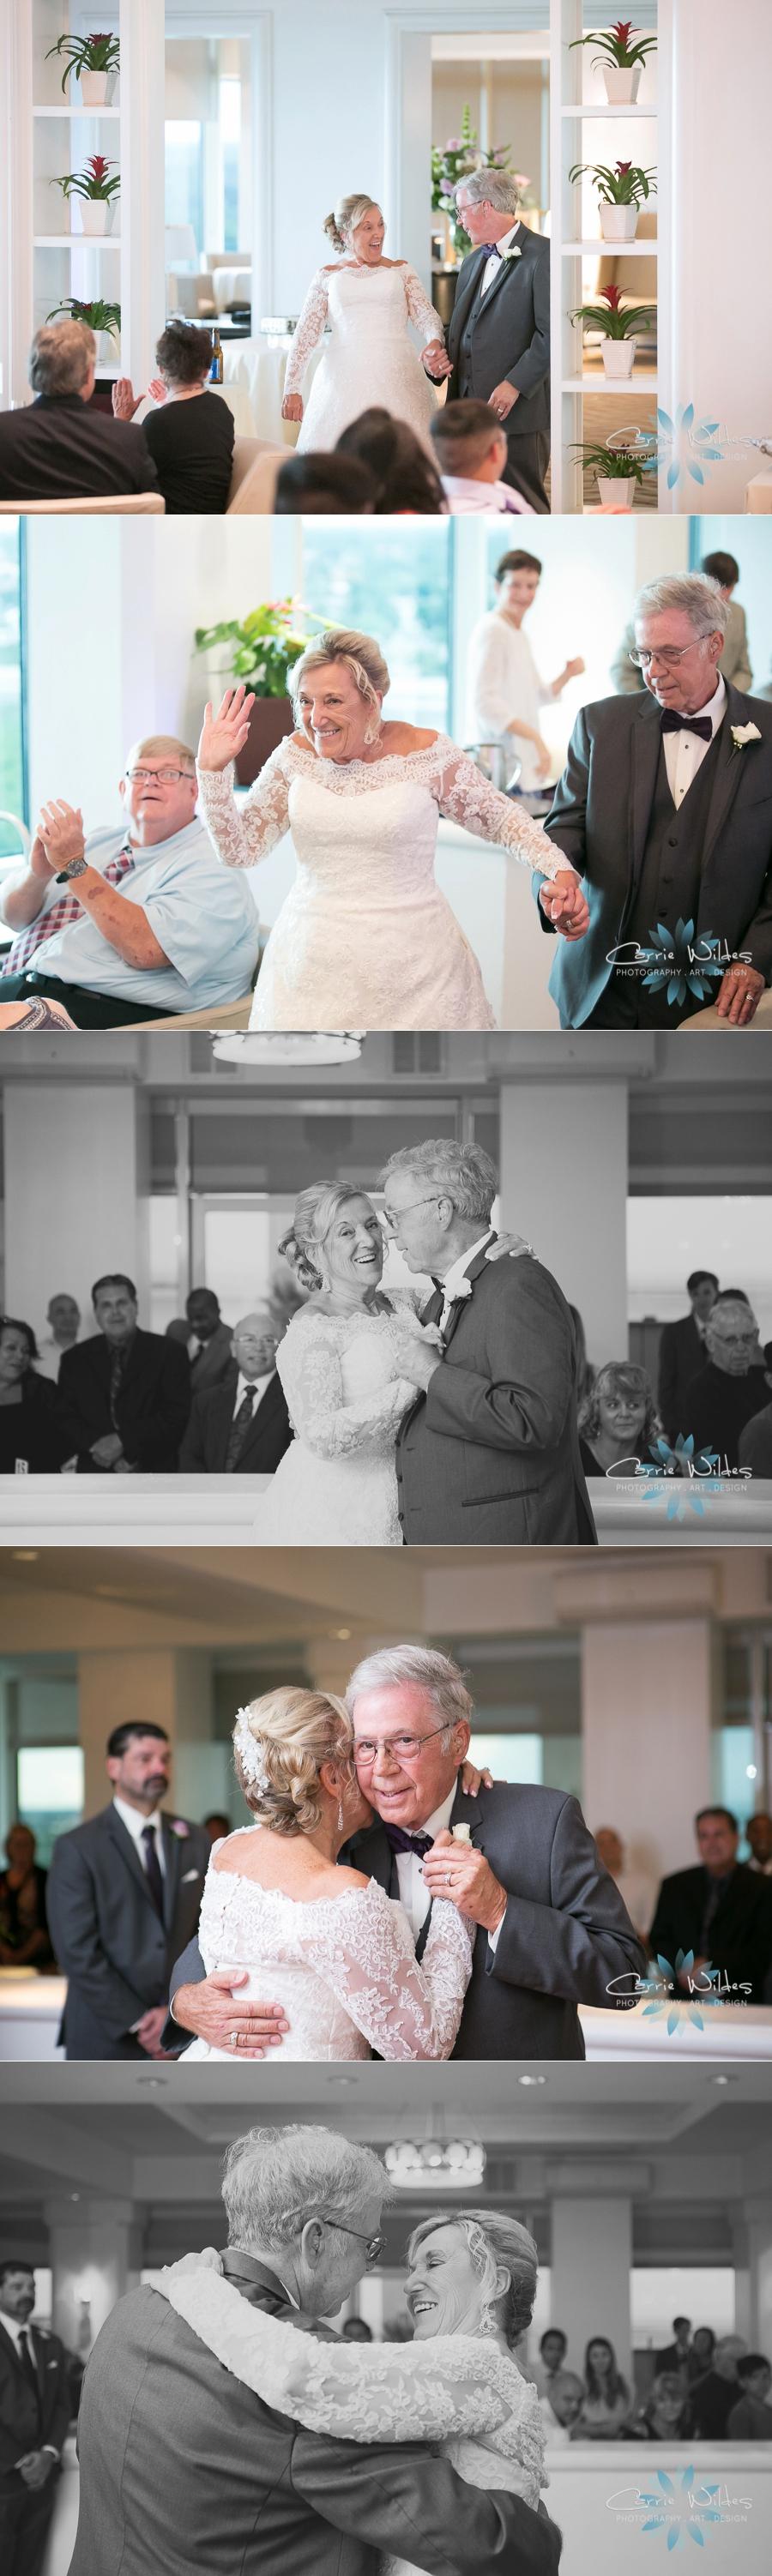 8_5_18 Donna and Bob Grand Hyatt Armani's Wedding_0010.jpg